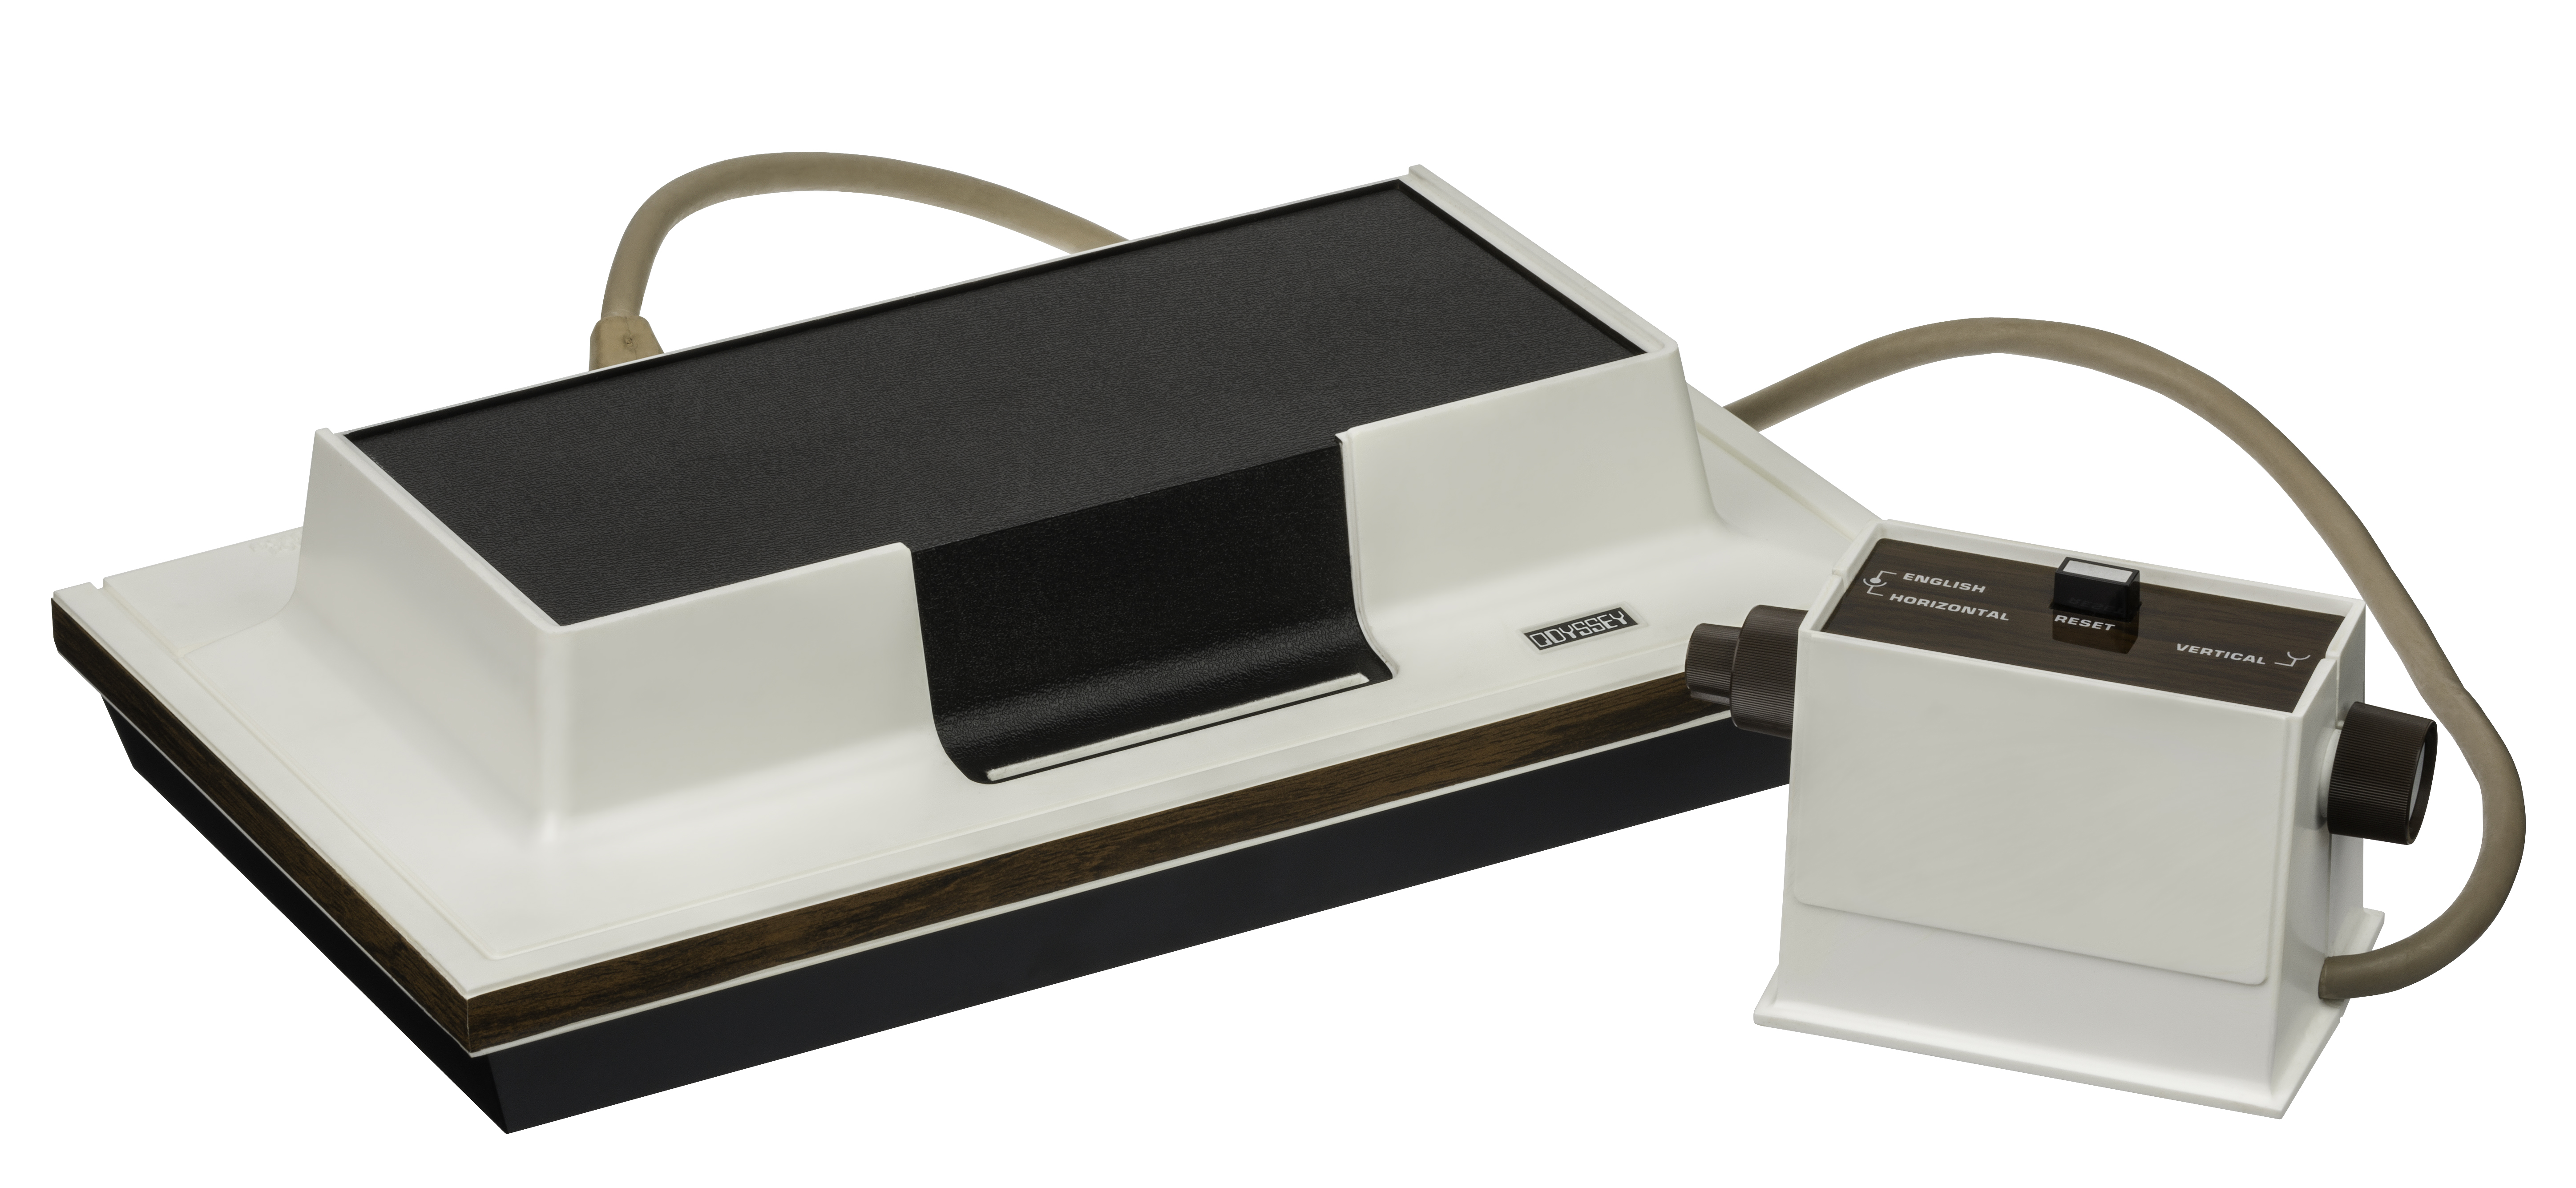 File:Magnavox-Odyssey-Console-Set-FR.jpg - Wikimedia Commons